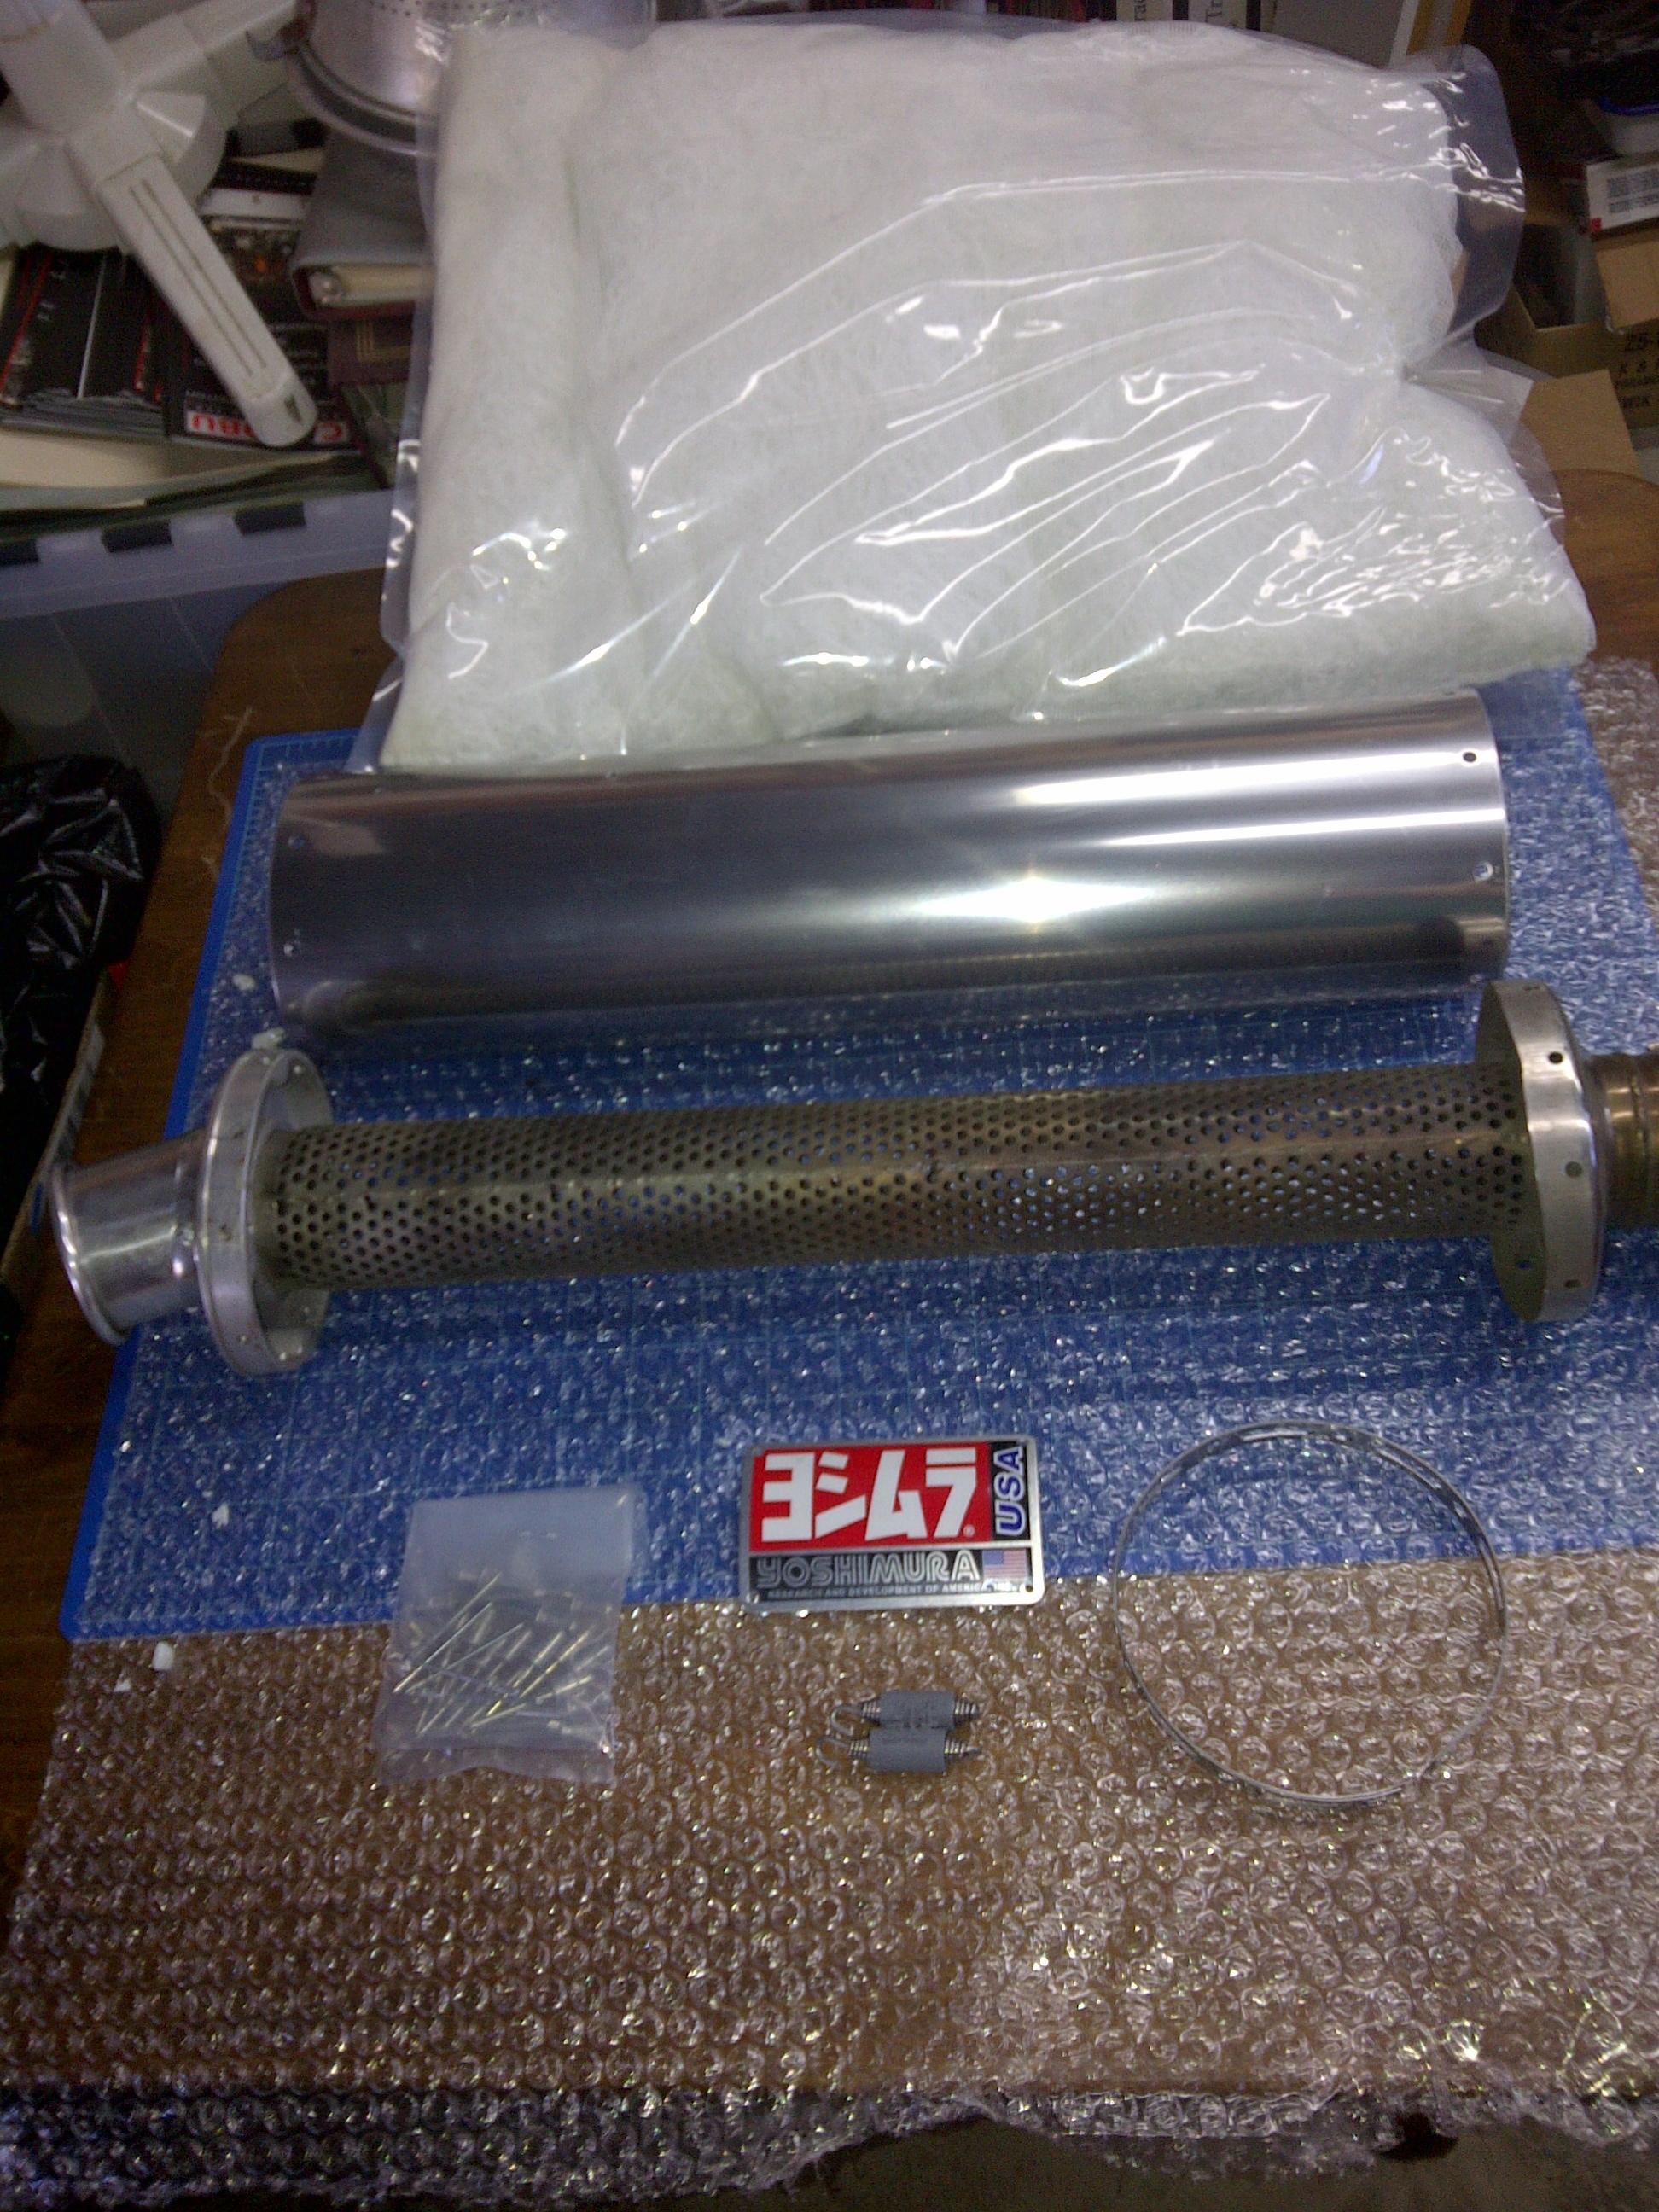 Yoshimura Muffler Rebuild Parts